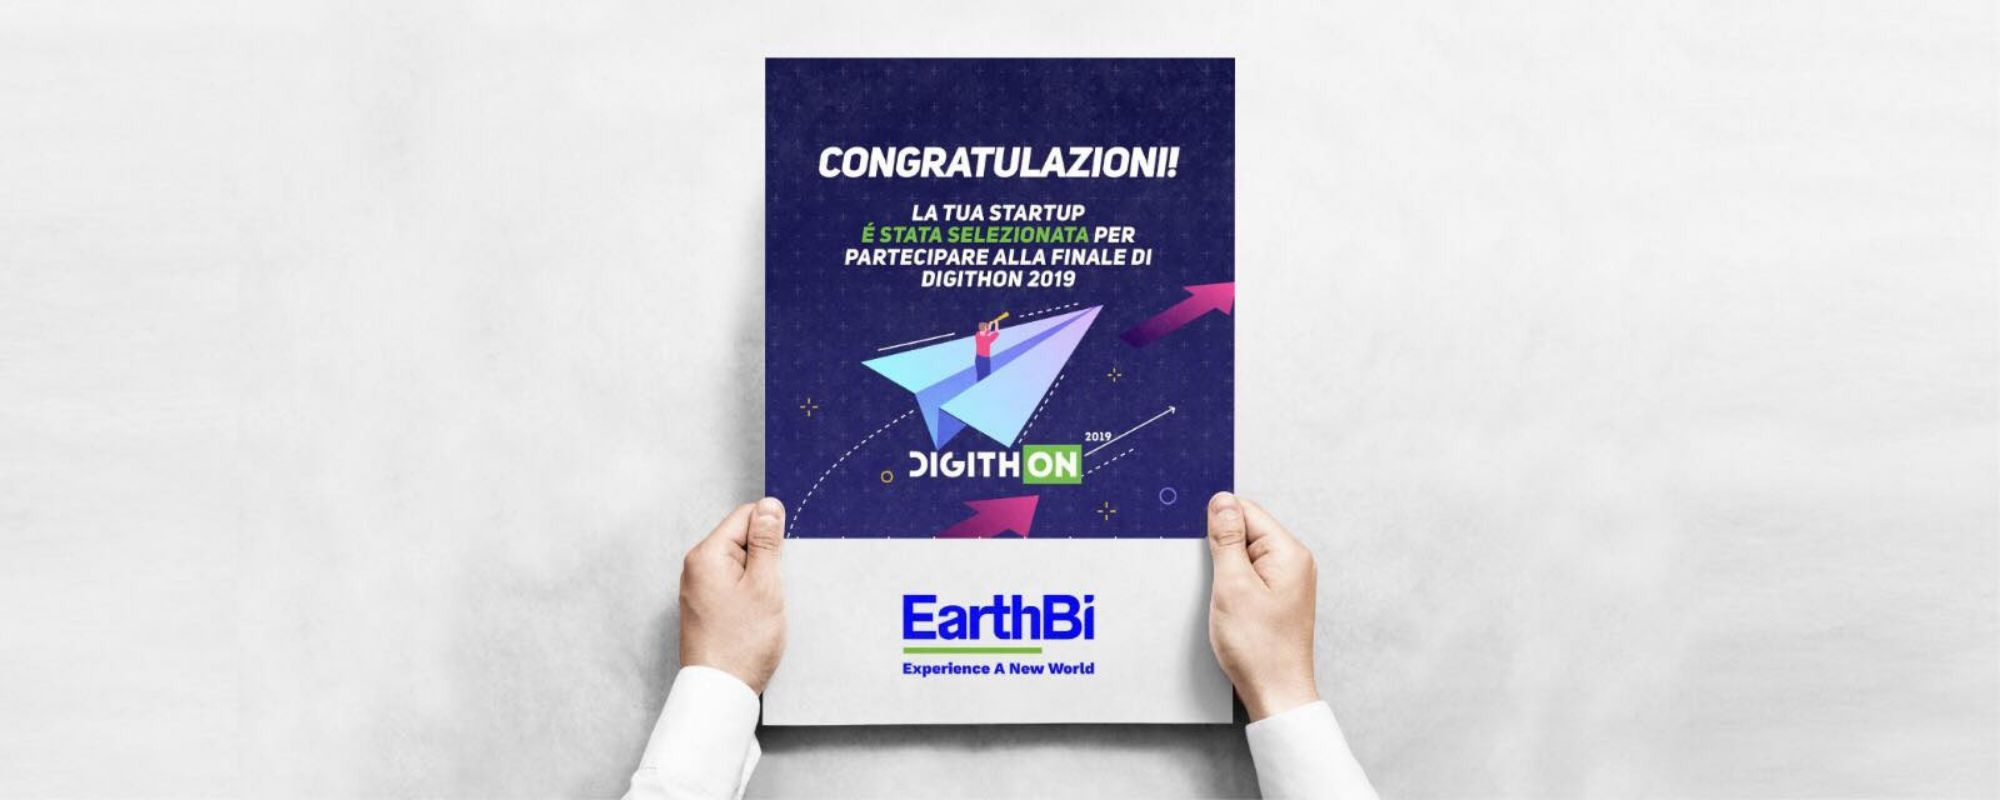 EarthBi finalist at DigithOn: the largest Italian digital marathon